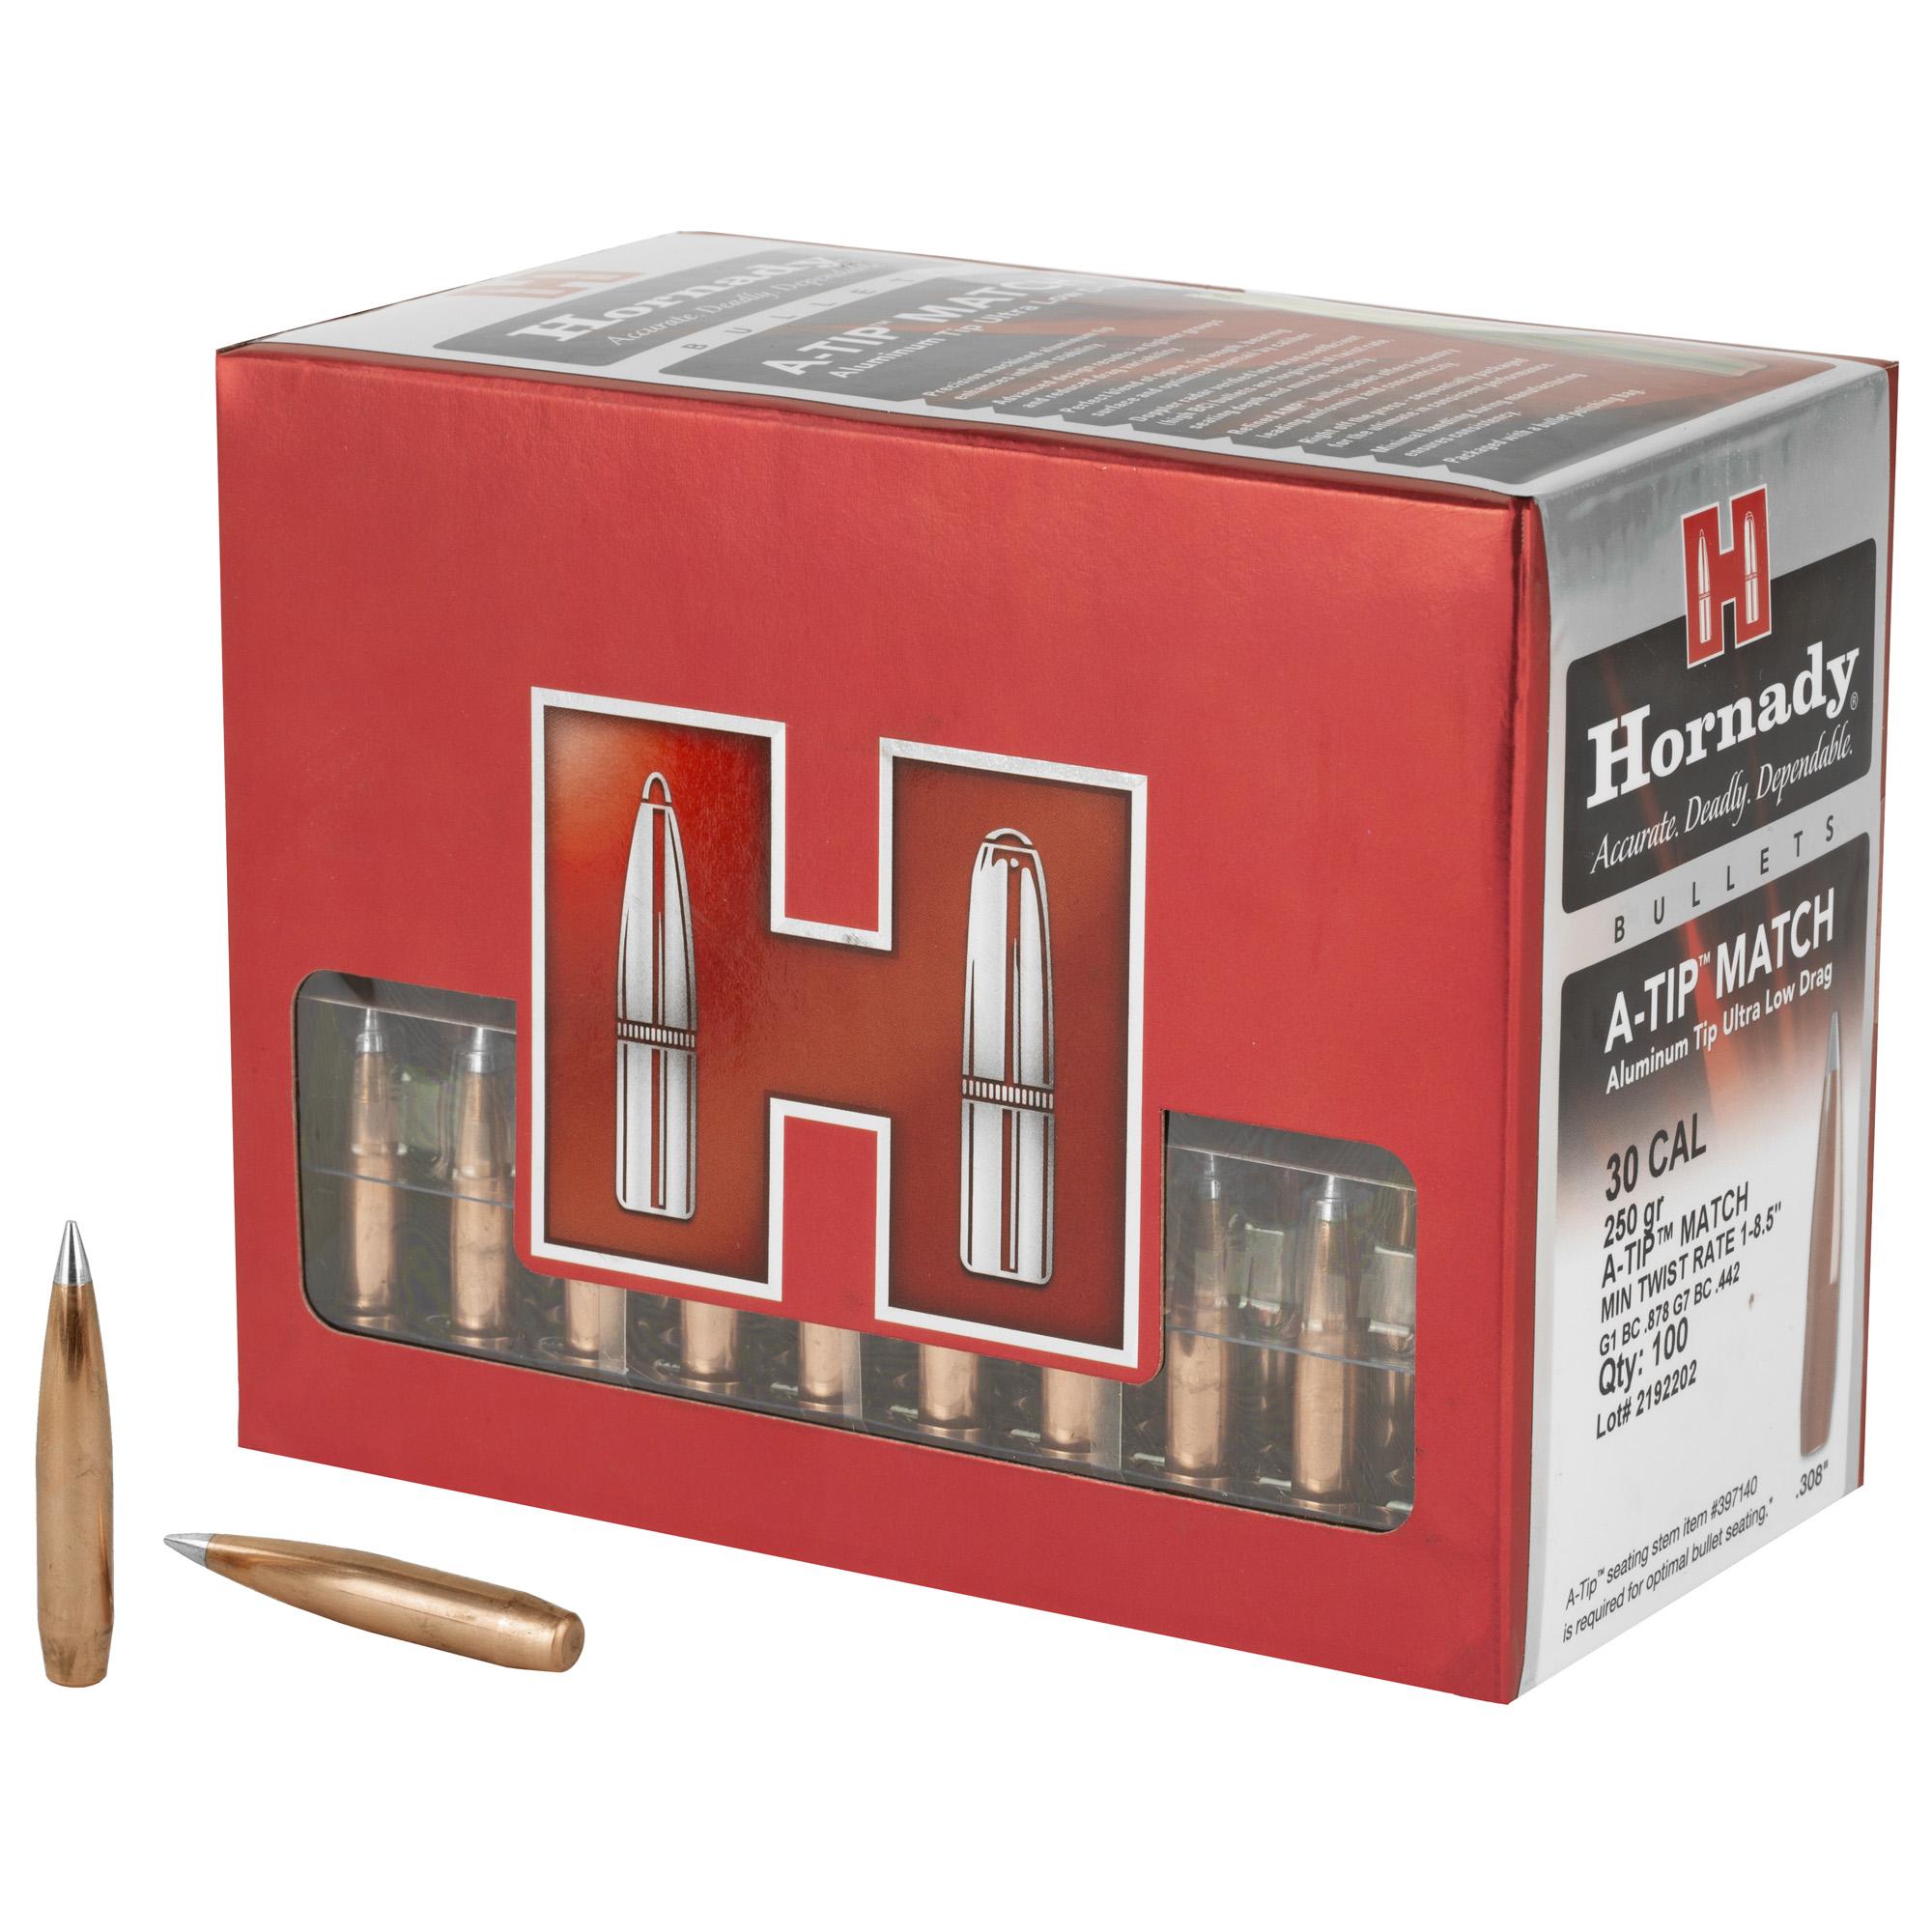 Hrndy A-tip 30cal .308 250gr 100ct